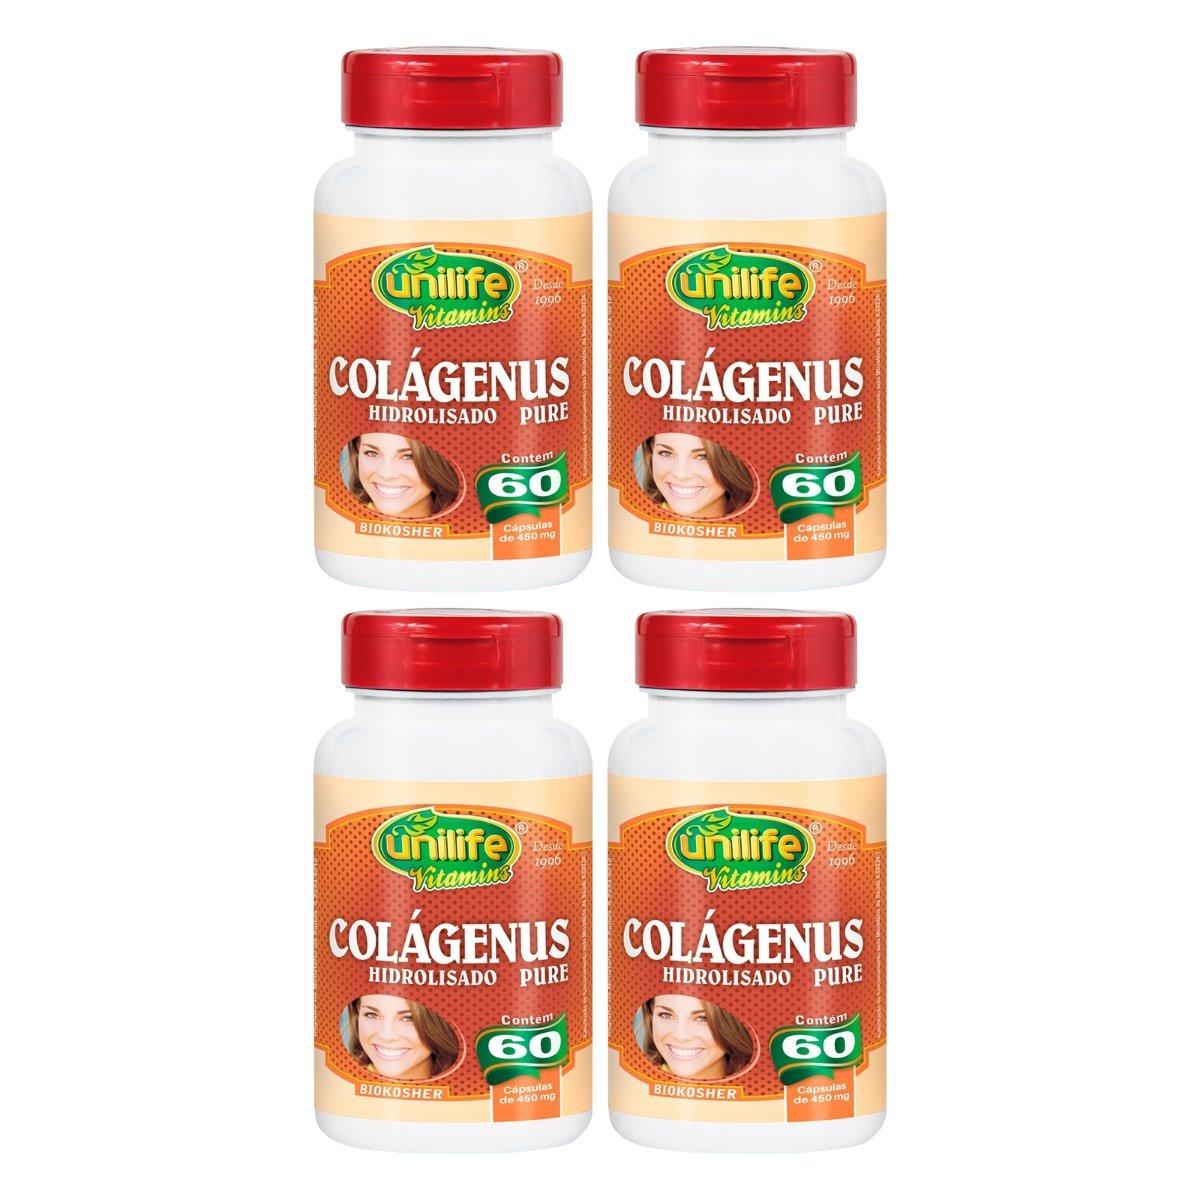 Colágeno Hidrolizado Puro Colagenus 60 Cápsulas Unilife Kit 4 Unidades